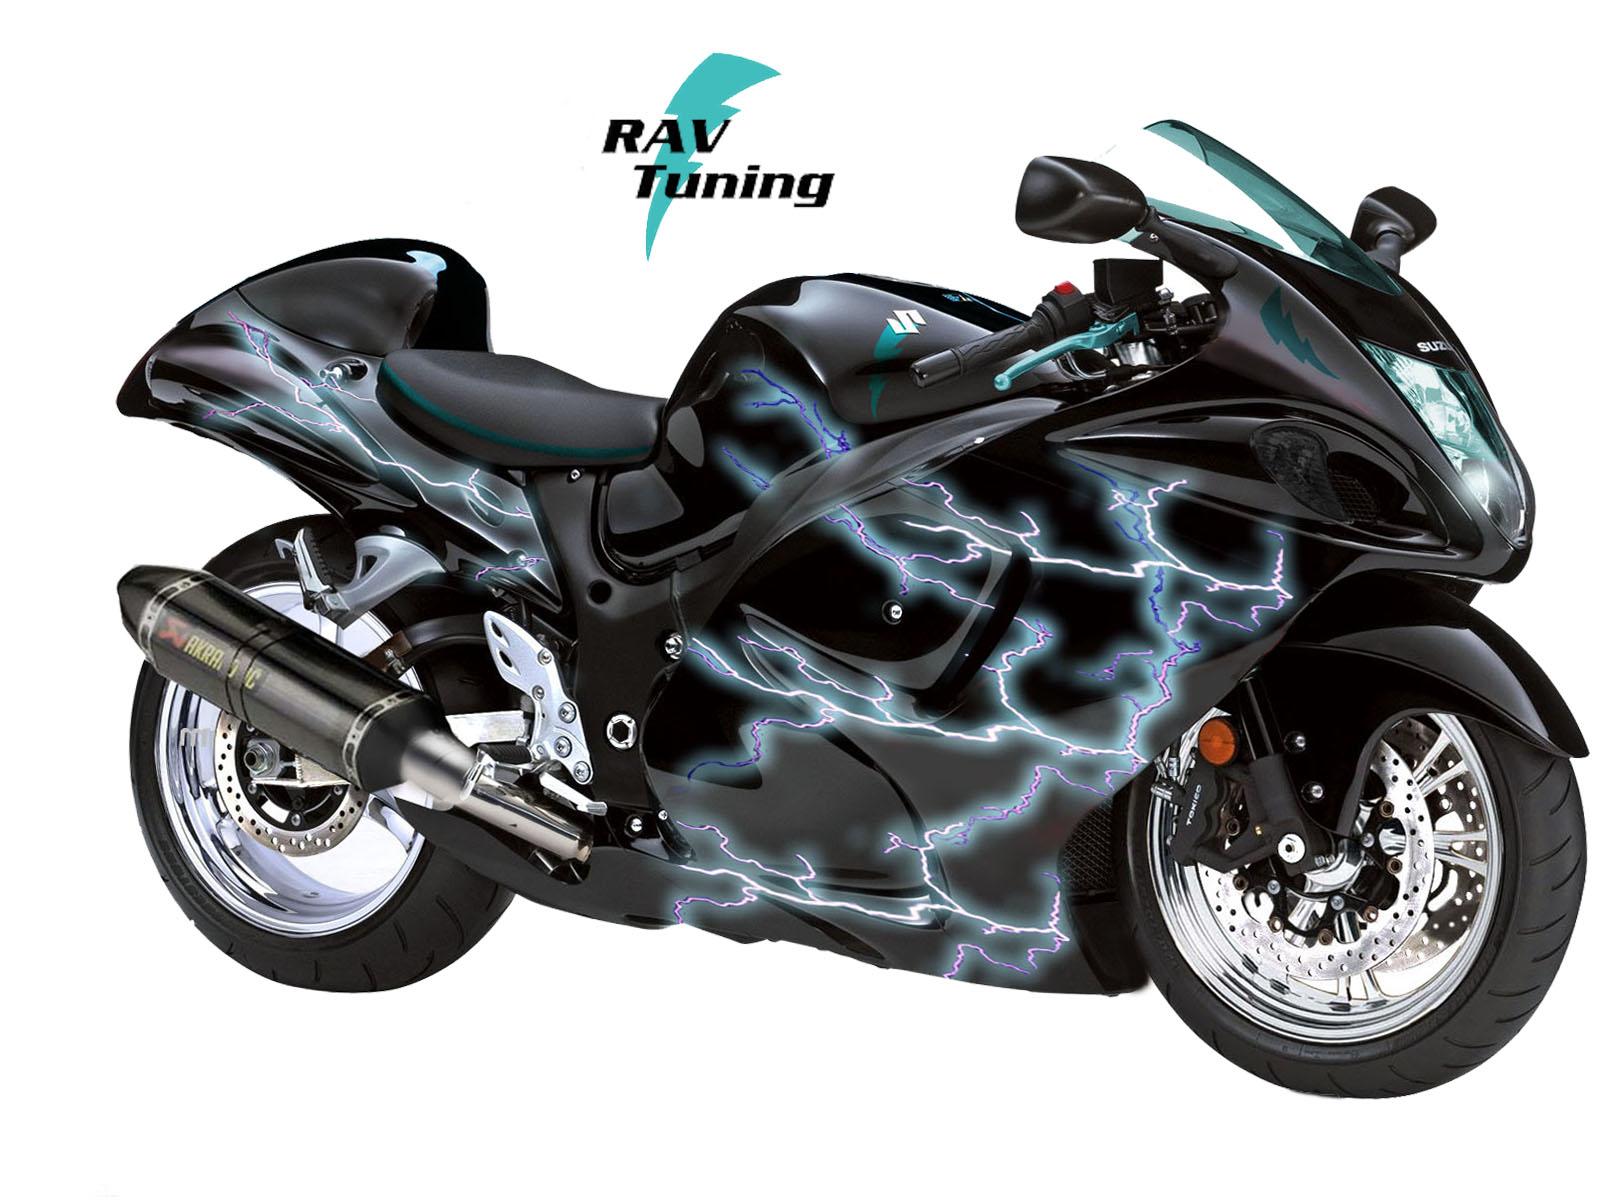 hayabusa tuning motorbikes 2560 - photo #45